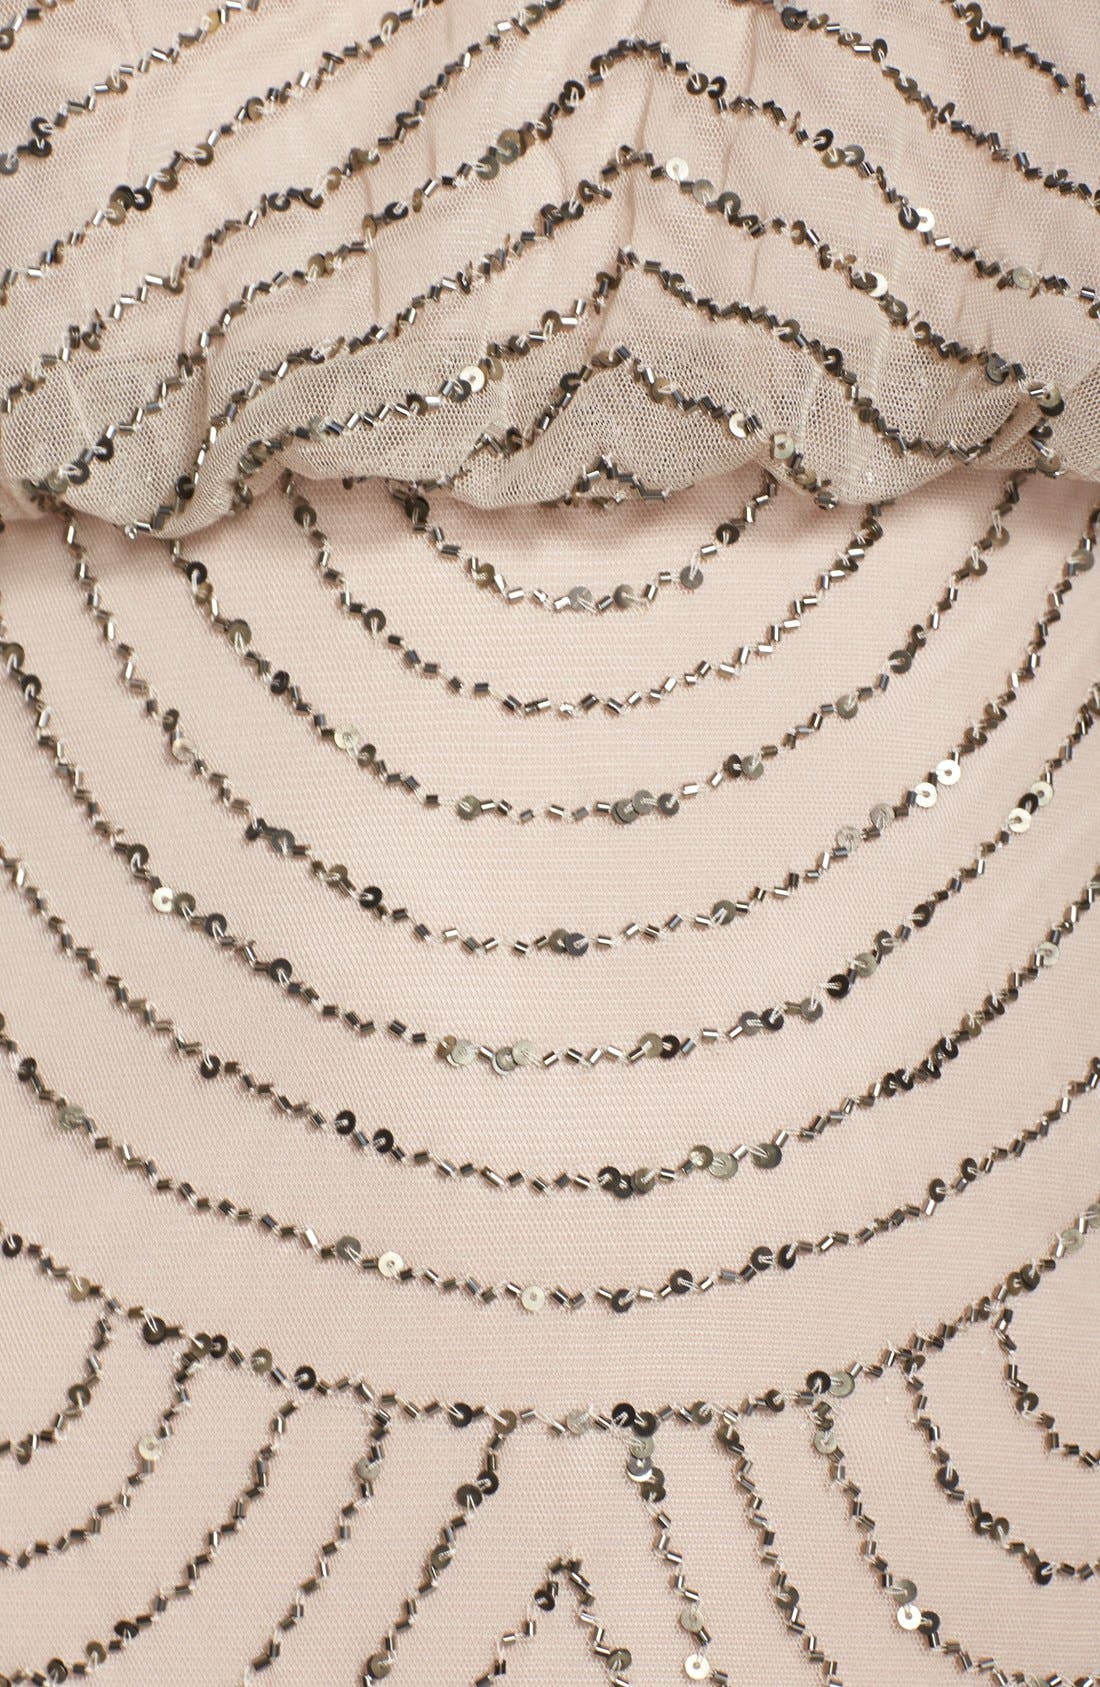 Sequin Mesh Blouson Dress,                             Alternate thumbnail 8, color,                             257